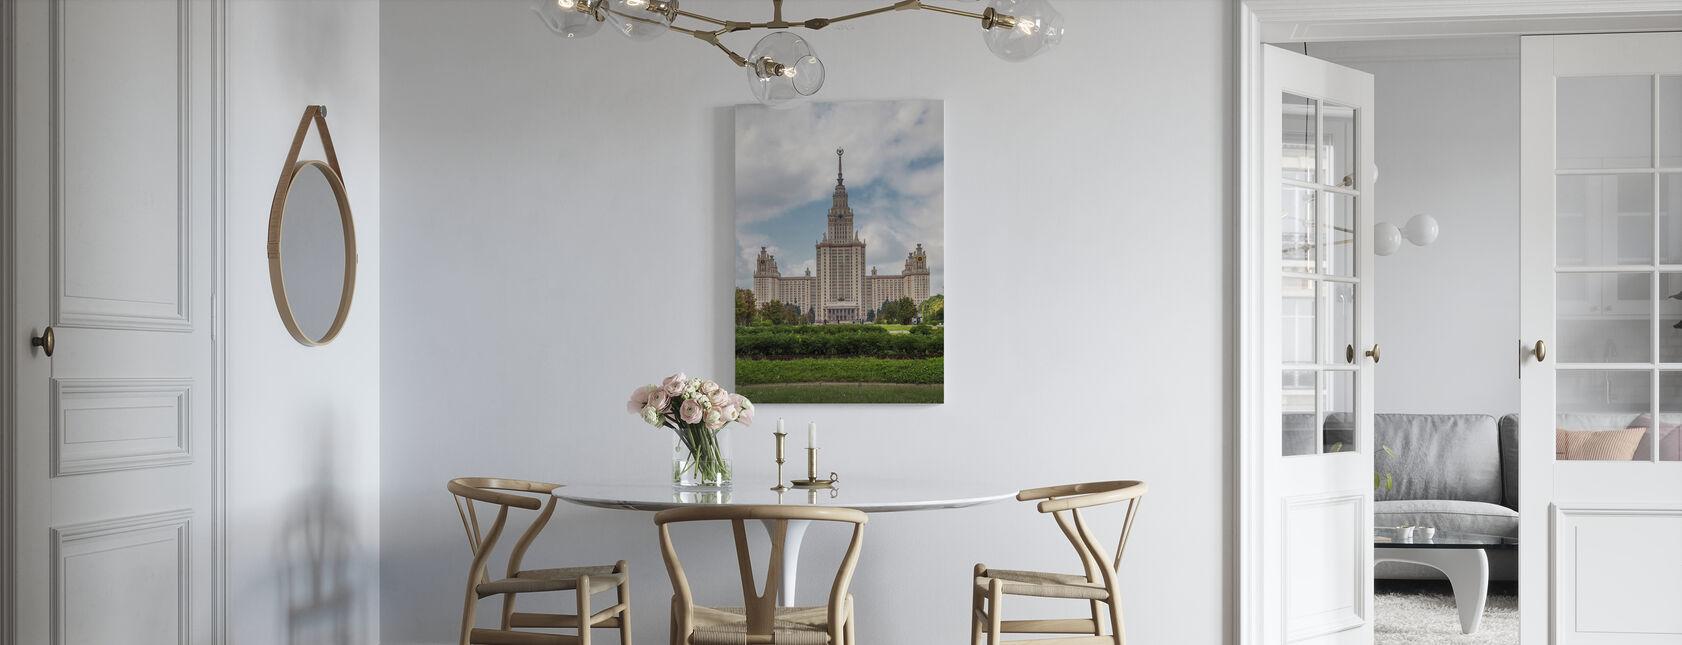 Lomonosov Moscow State University - Canvas print - Kitchen